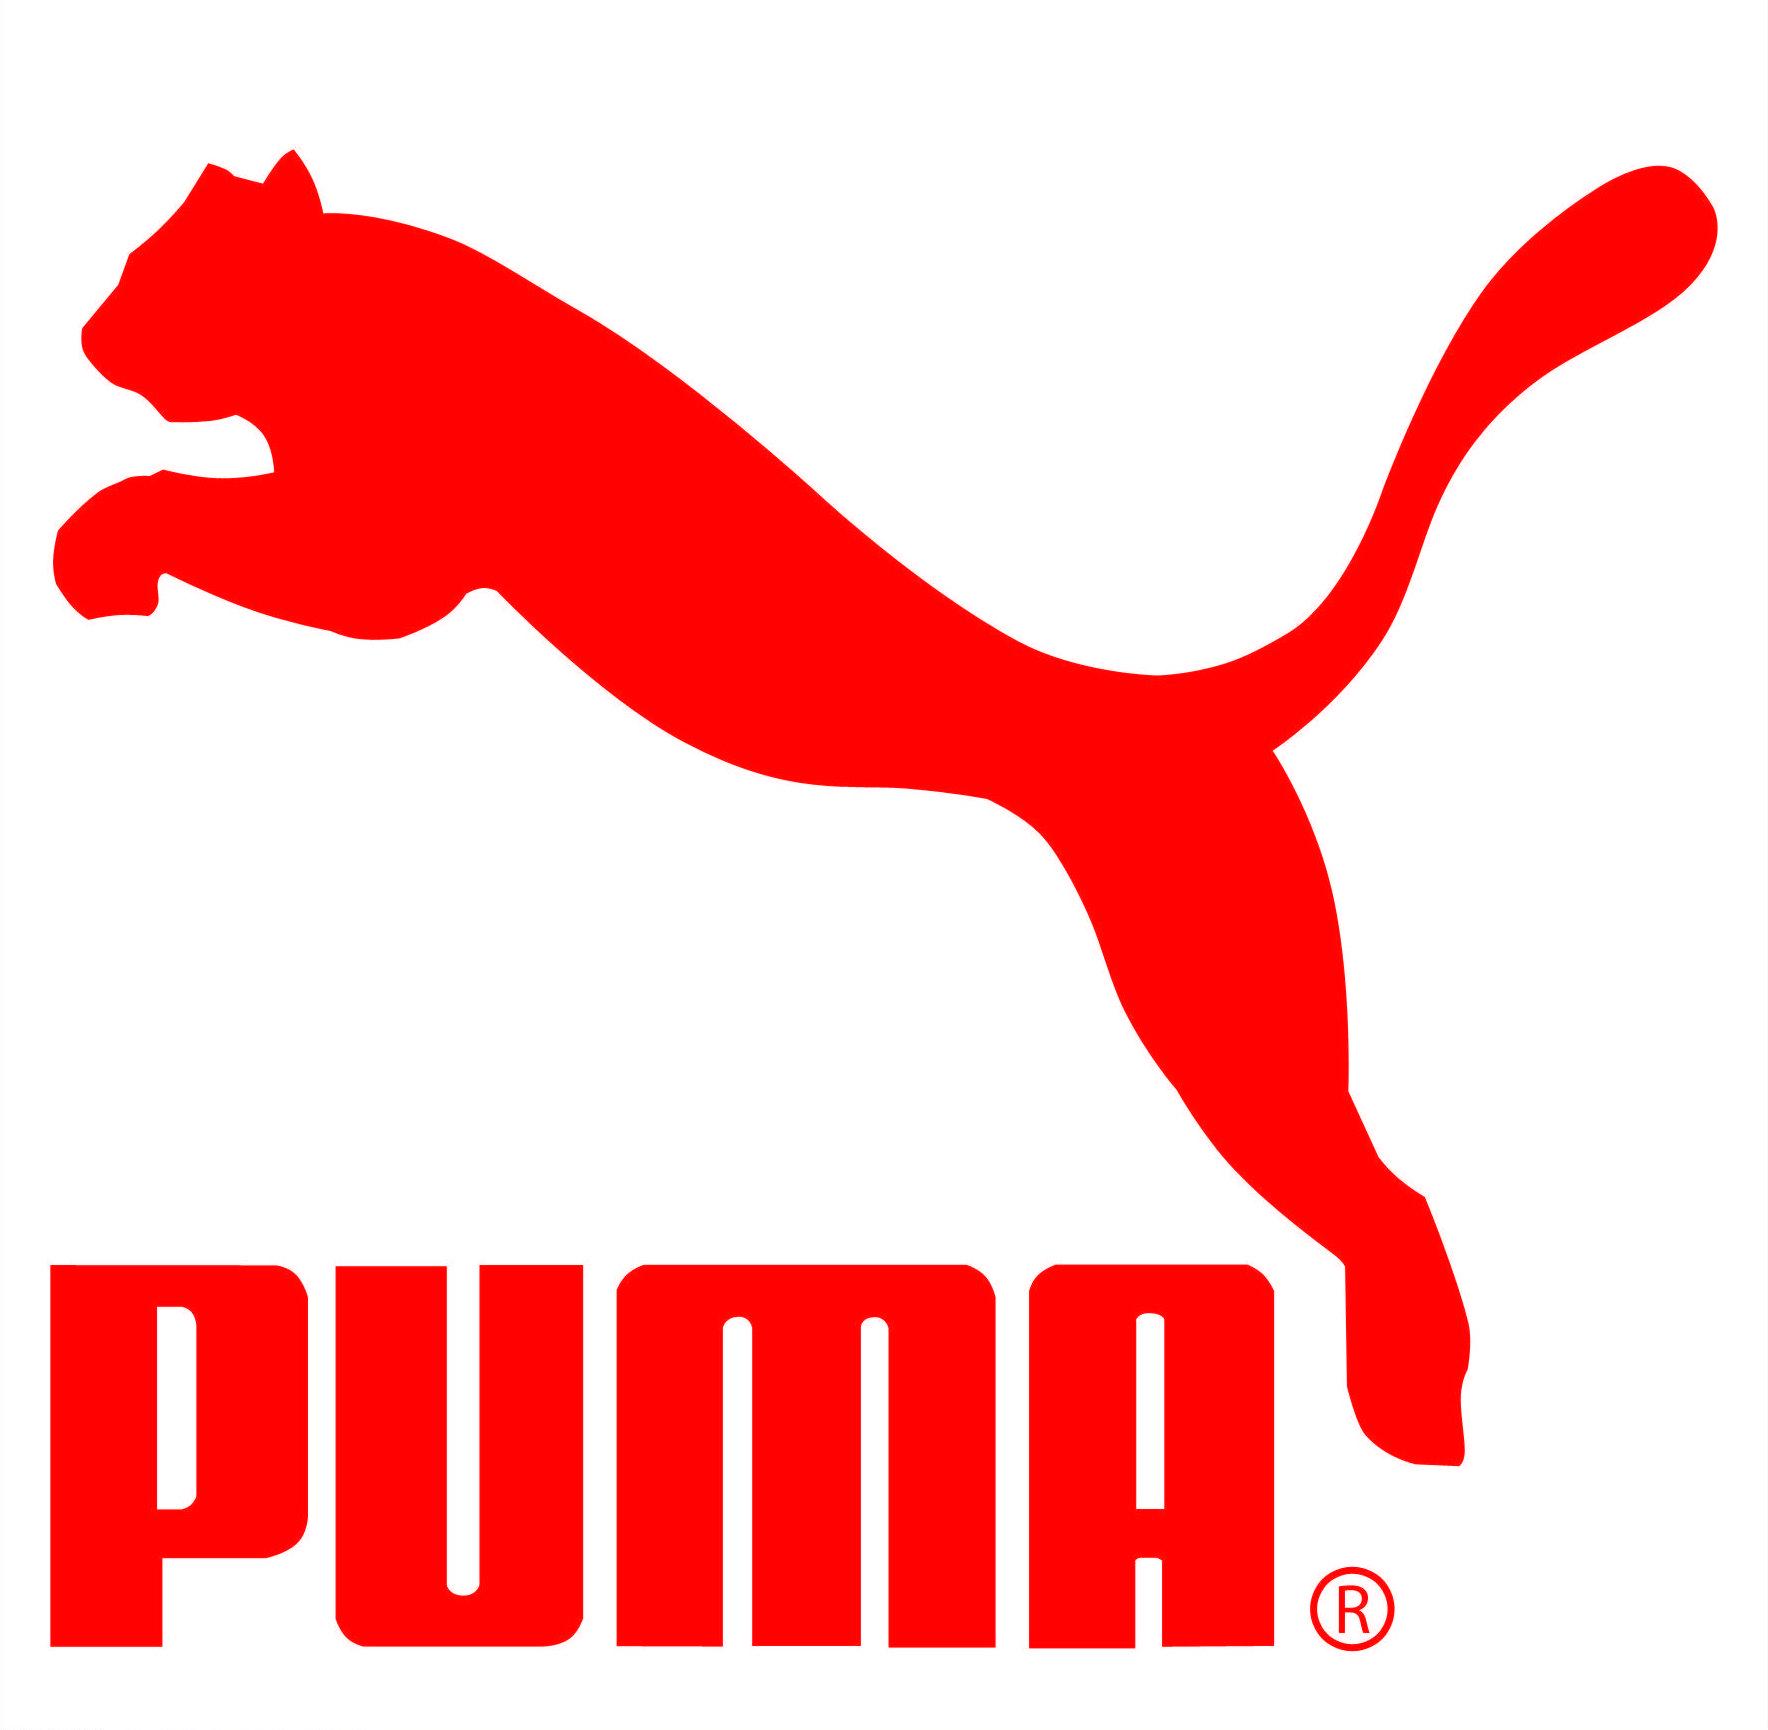 Puma logos.jpg